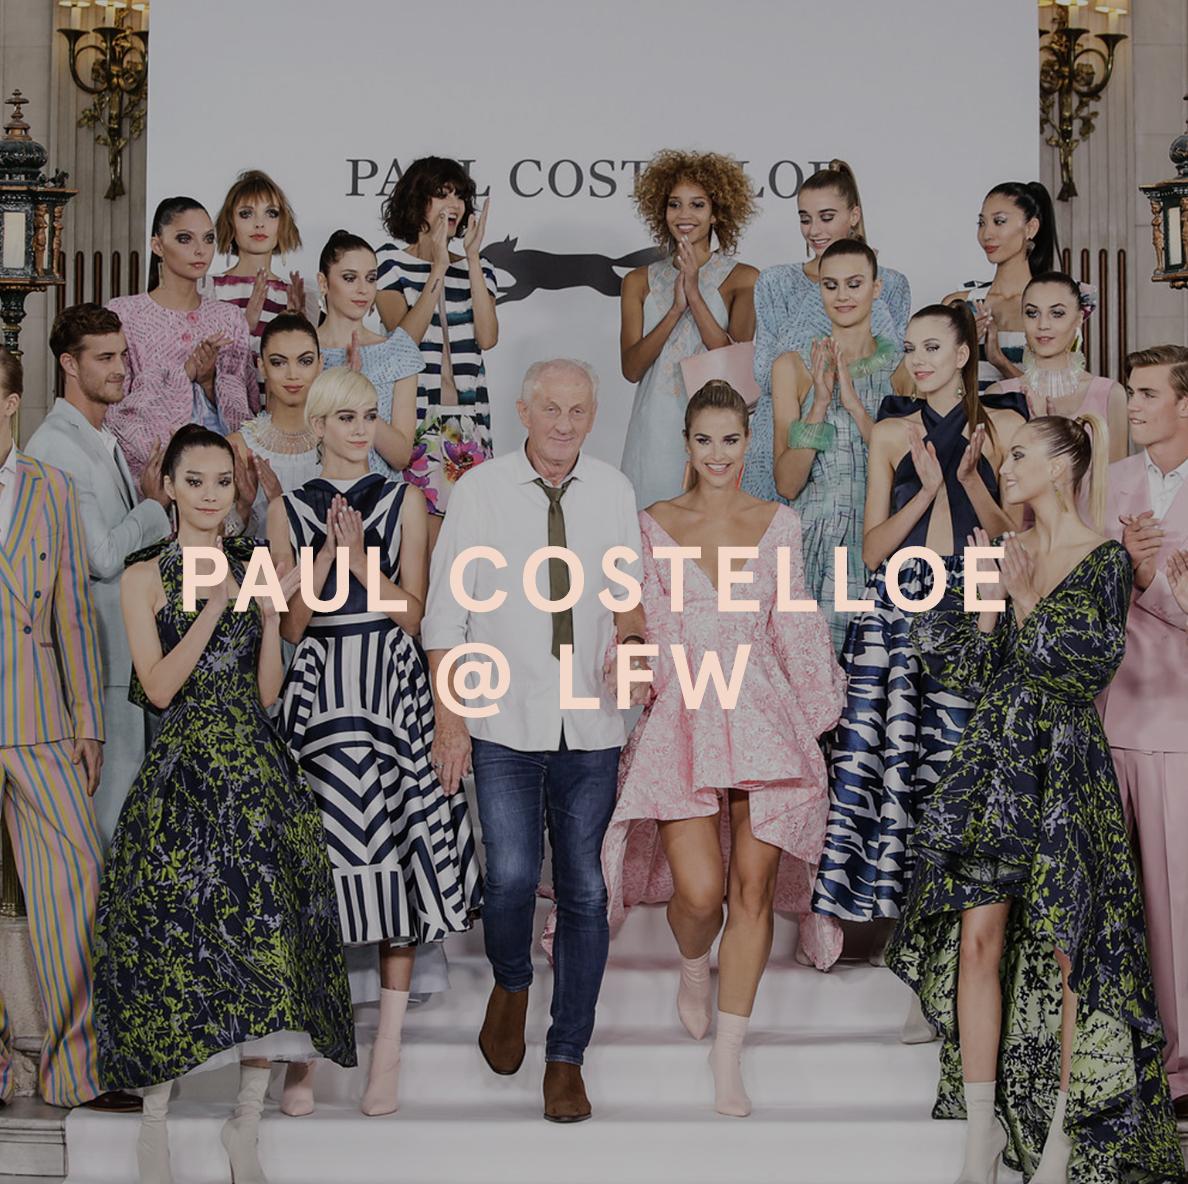 LFW Paul Costelloe Ego Shoes